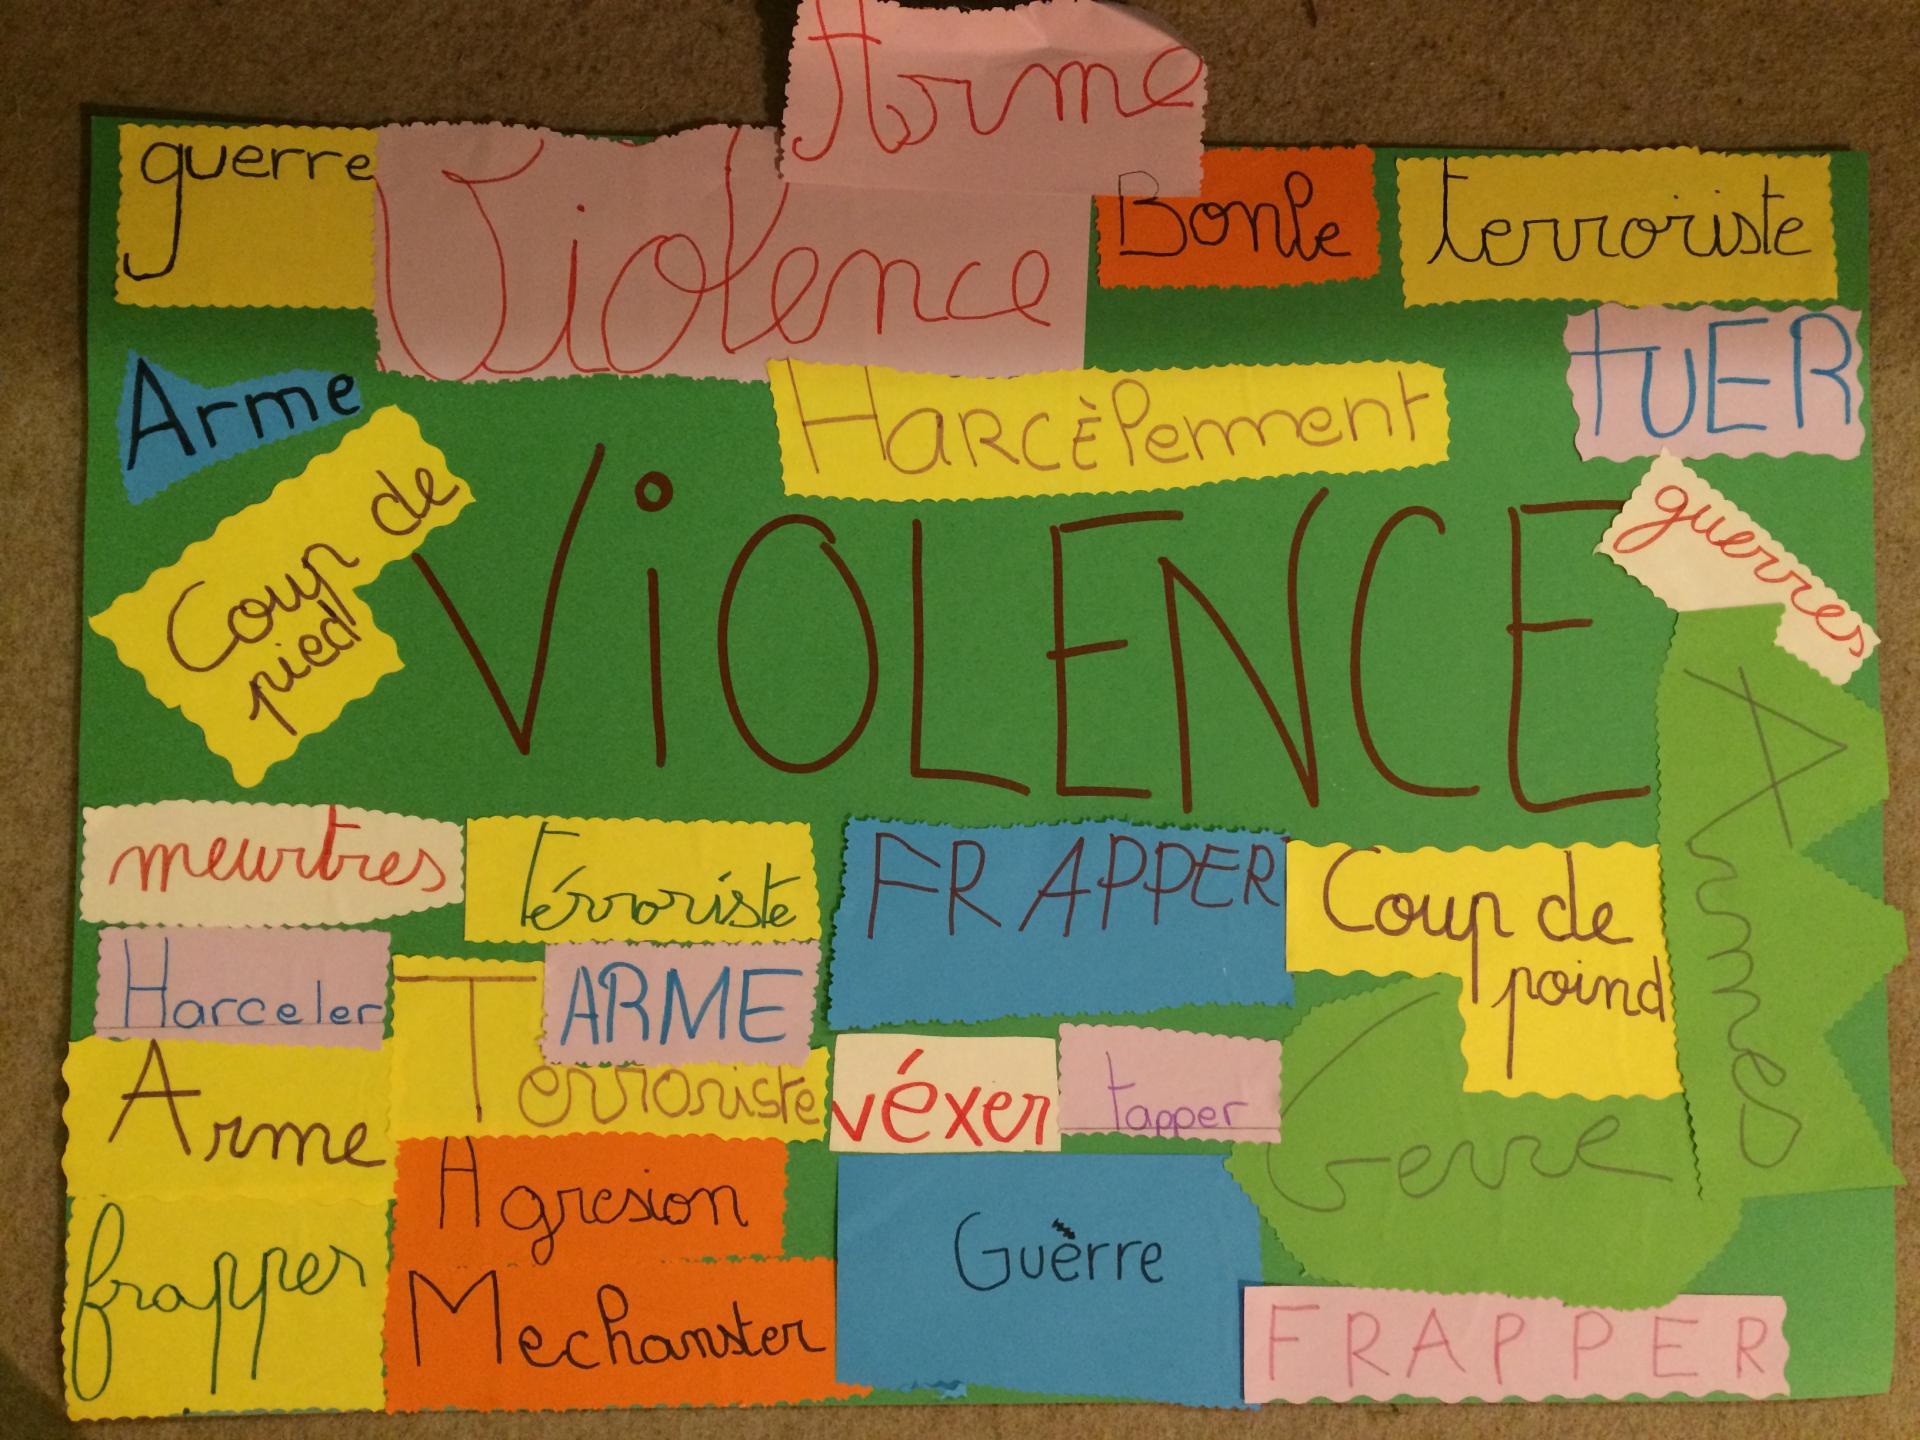 Les mots de violence